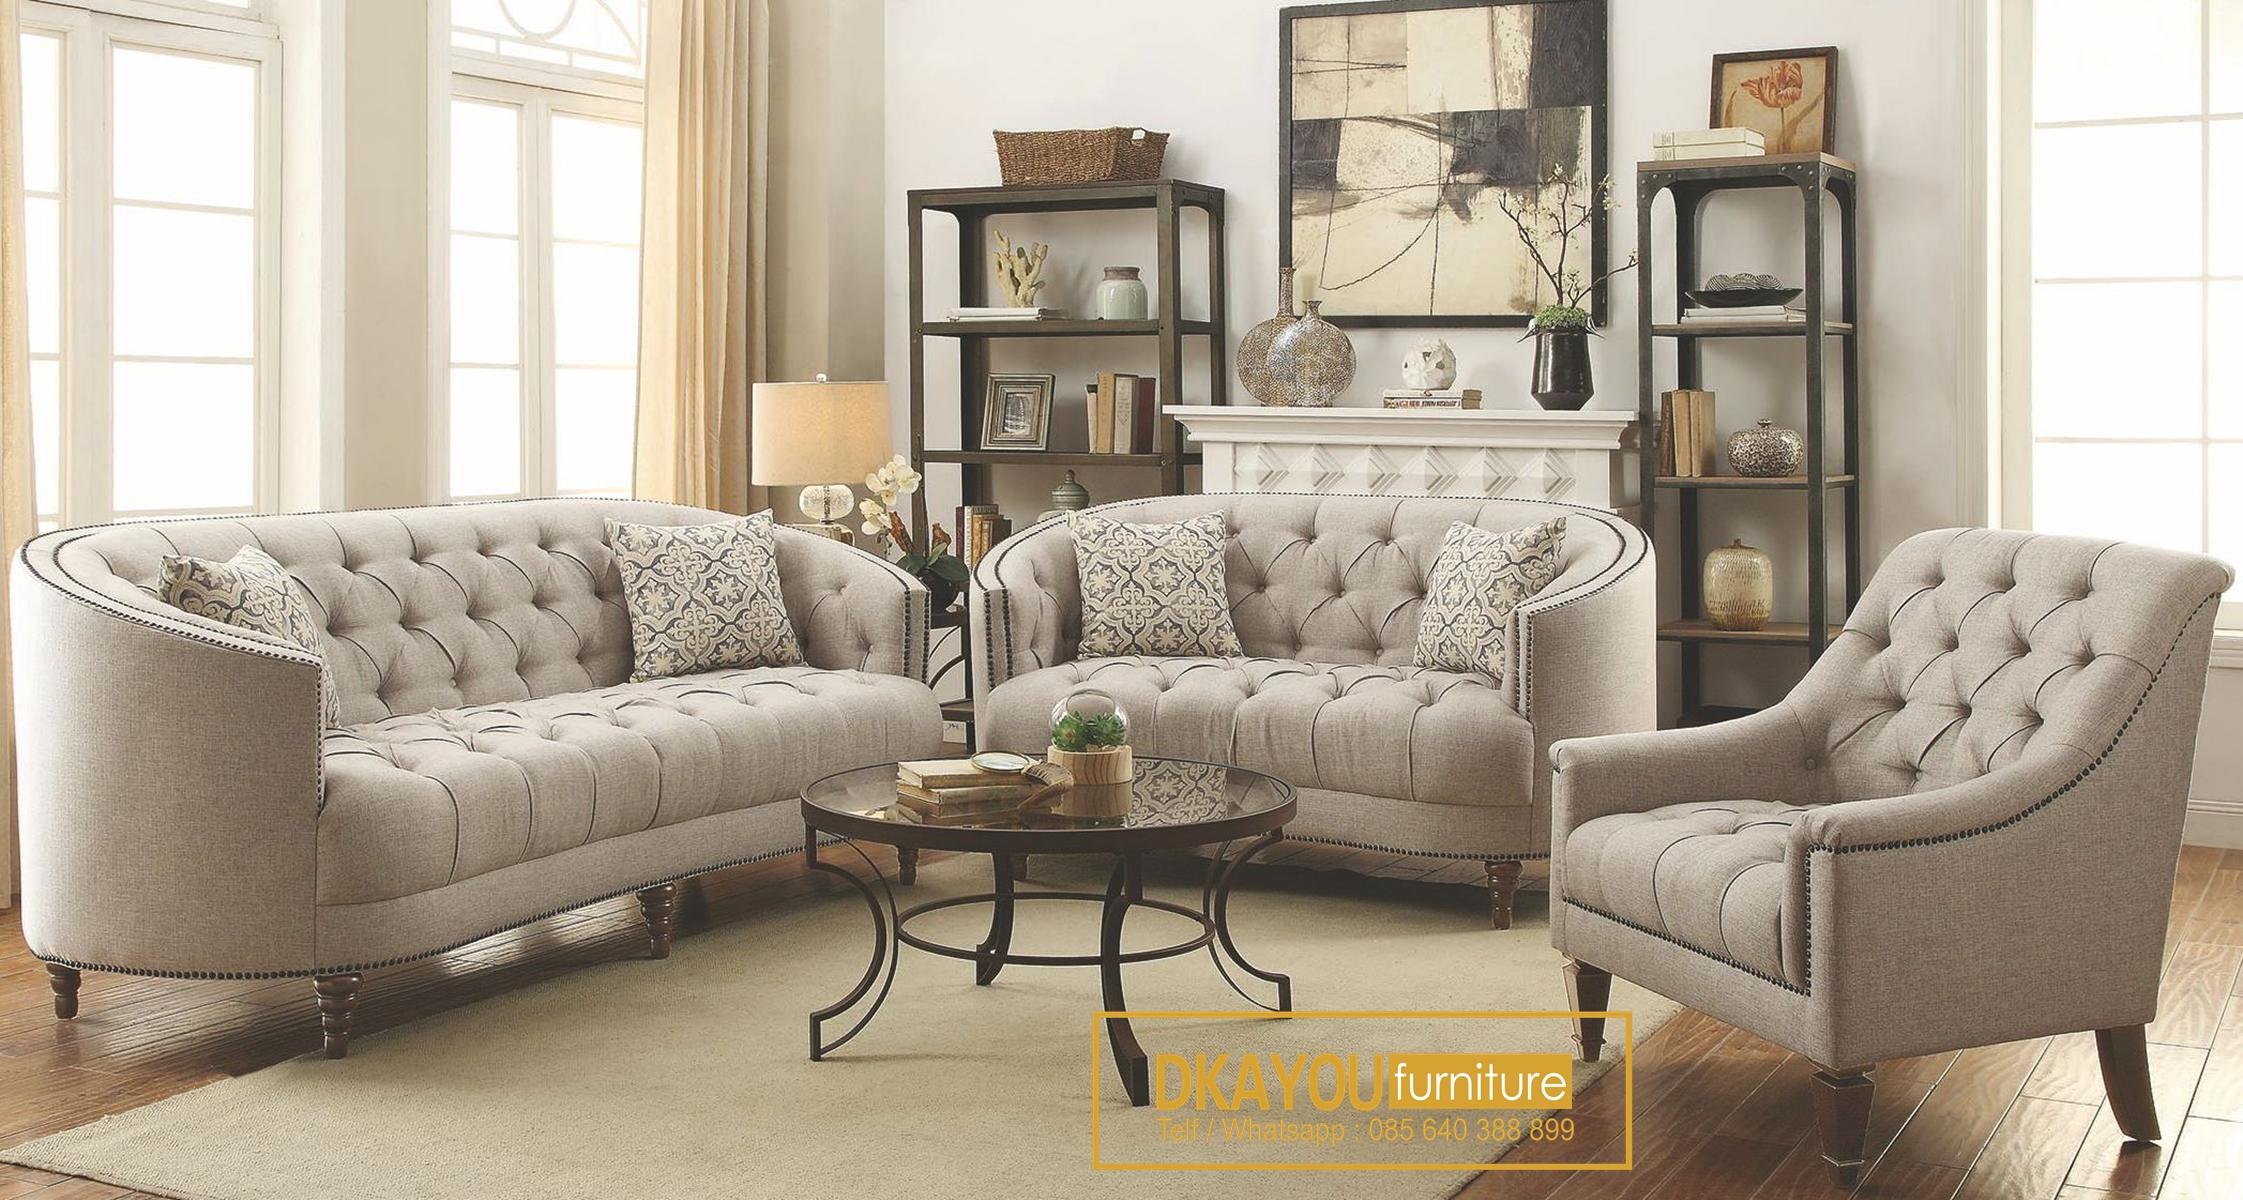 Set Sofa Tamu Minimalis Modern Vintage Retro Homedecor Vintage